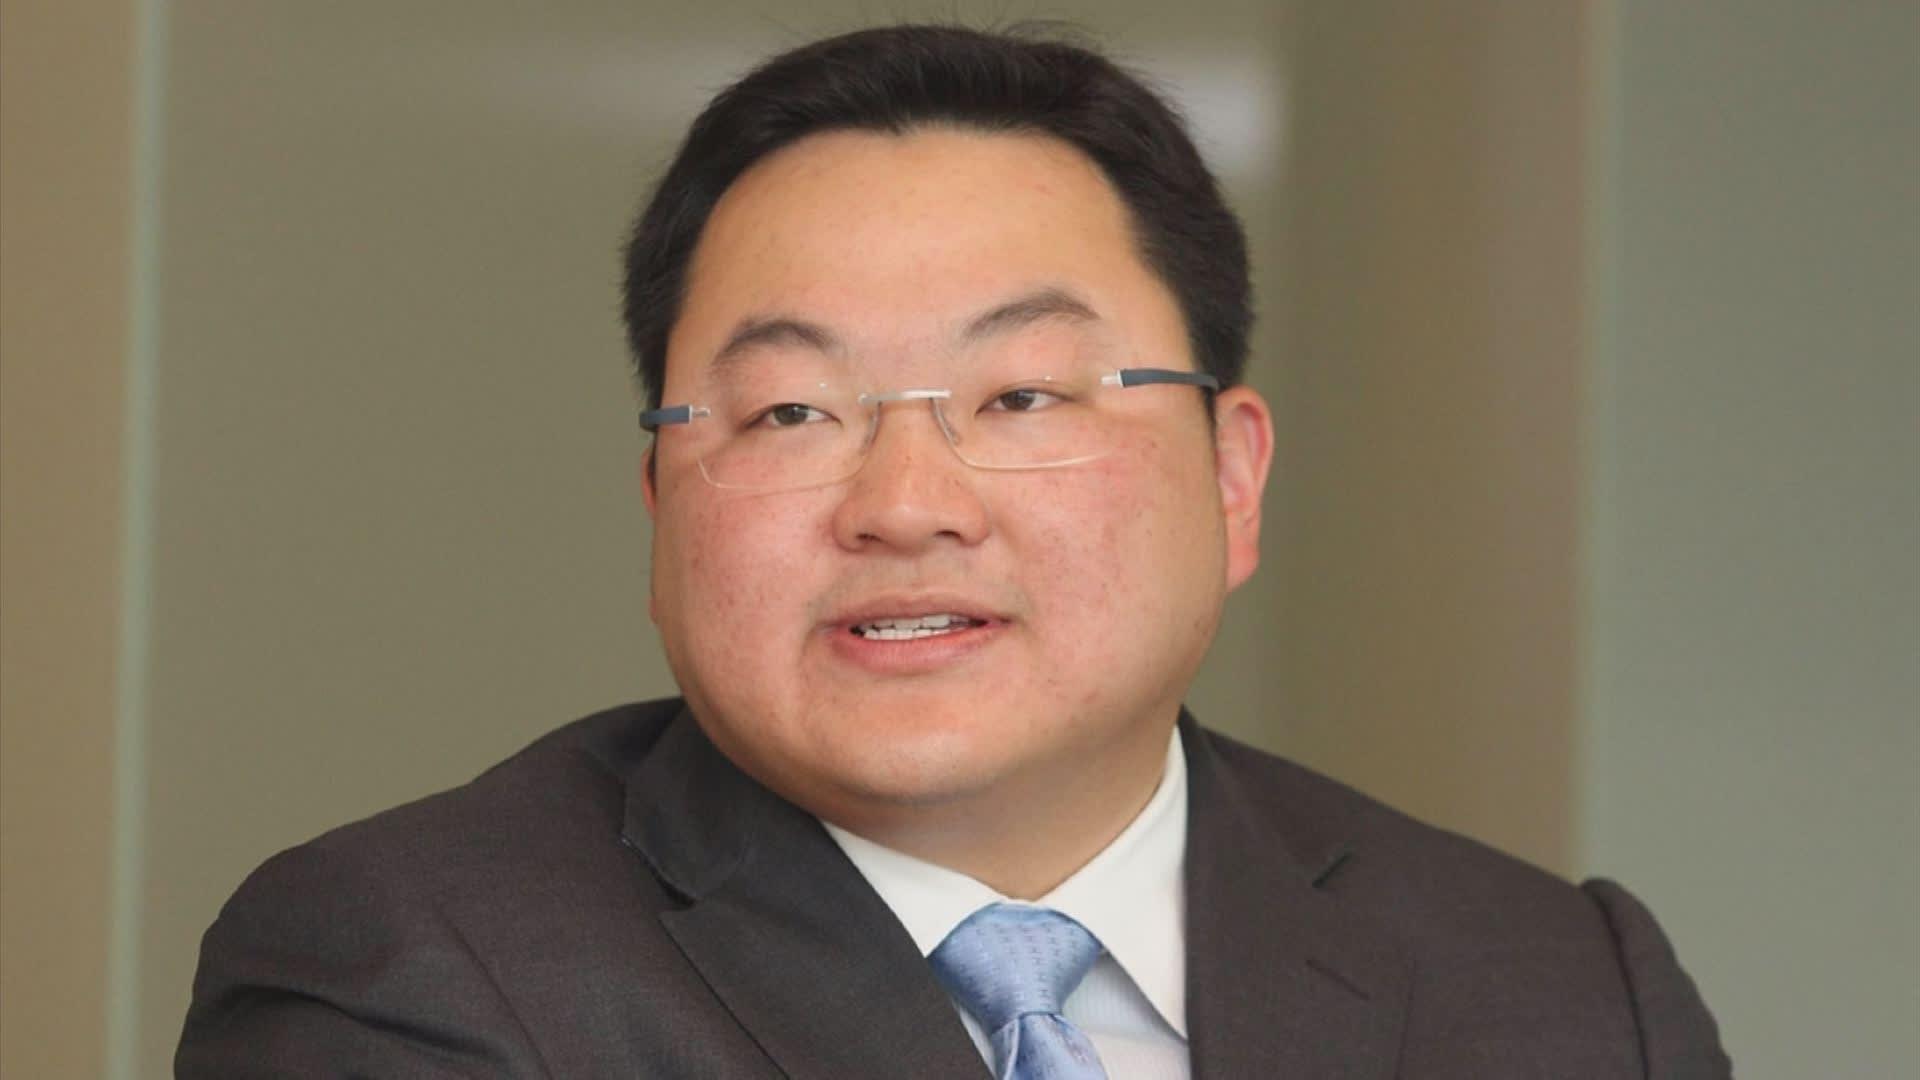 A star-studded, scandal: Jho Low's $5 billion heist